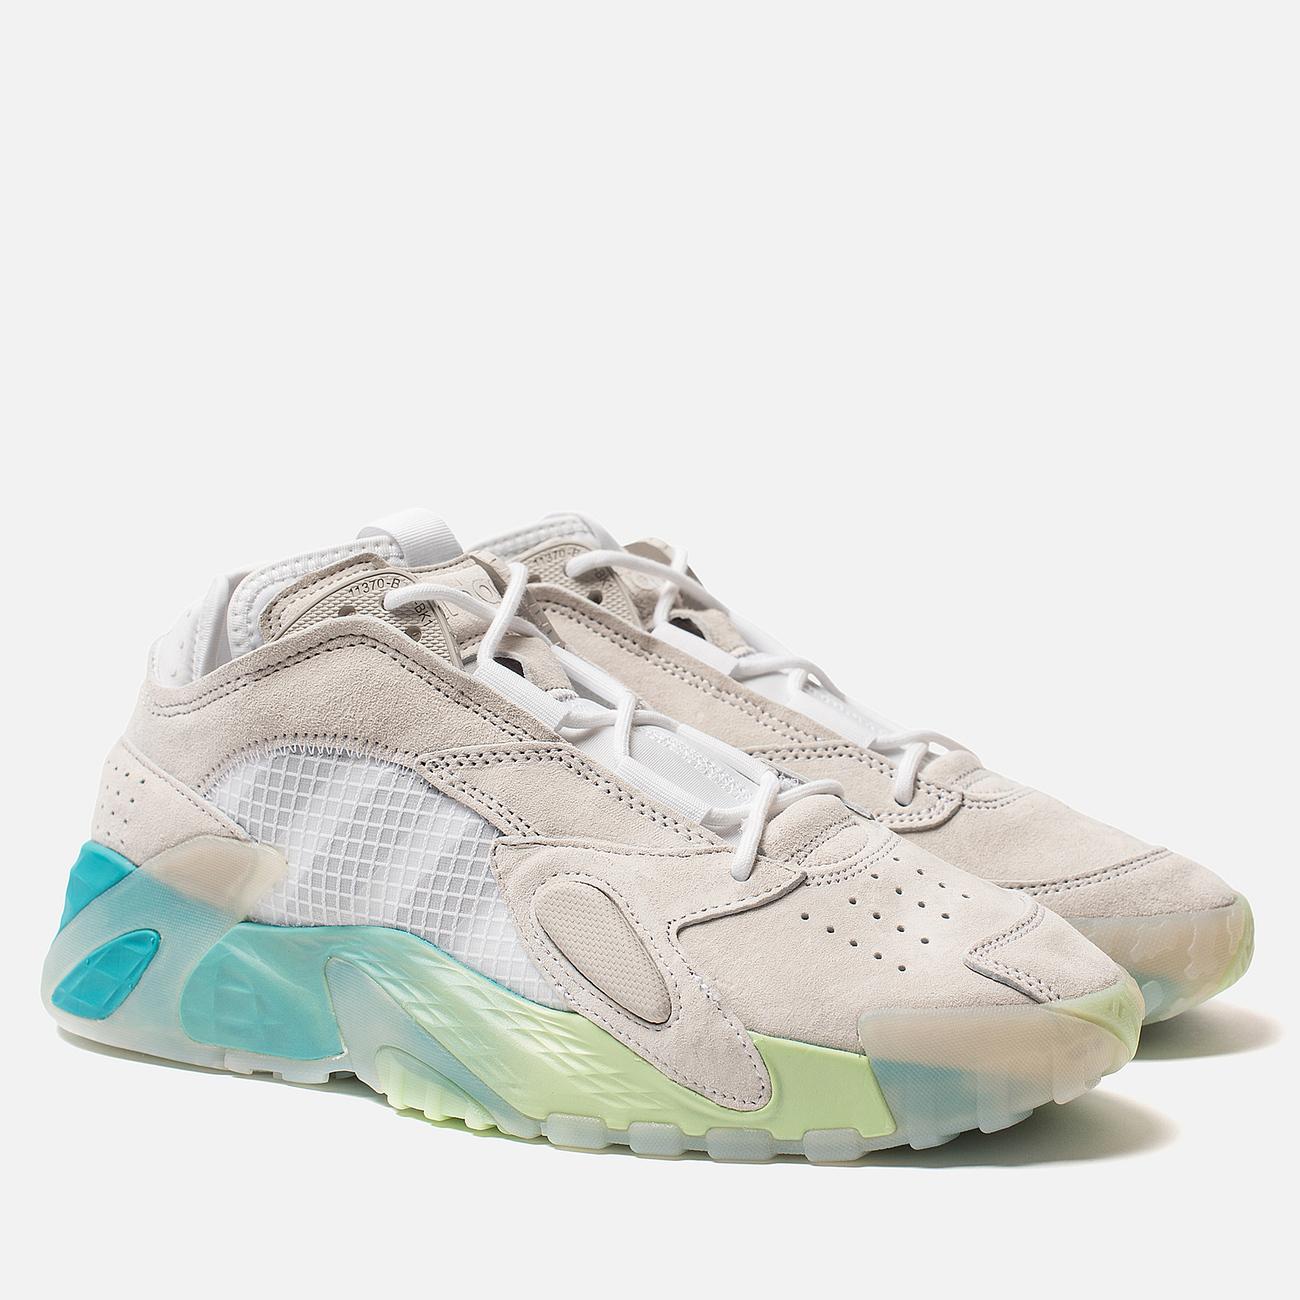 Кроссовки adidas Originals Streetball White/Glow Green/Hi-Res Aqua